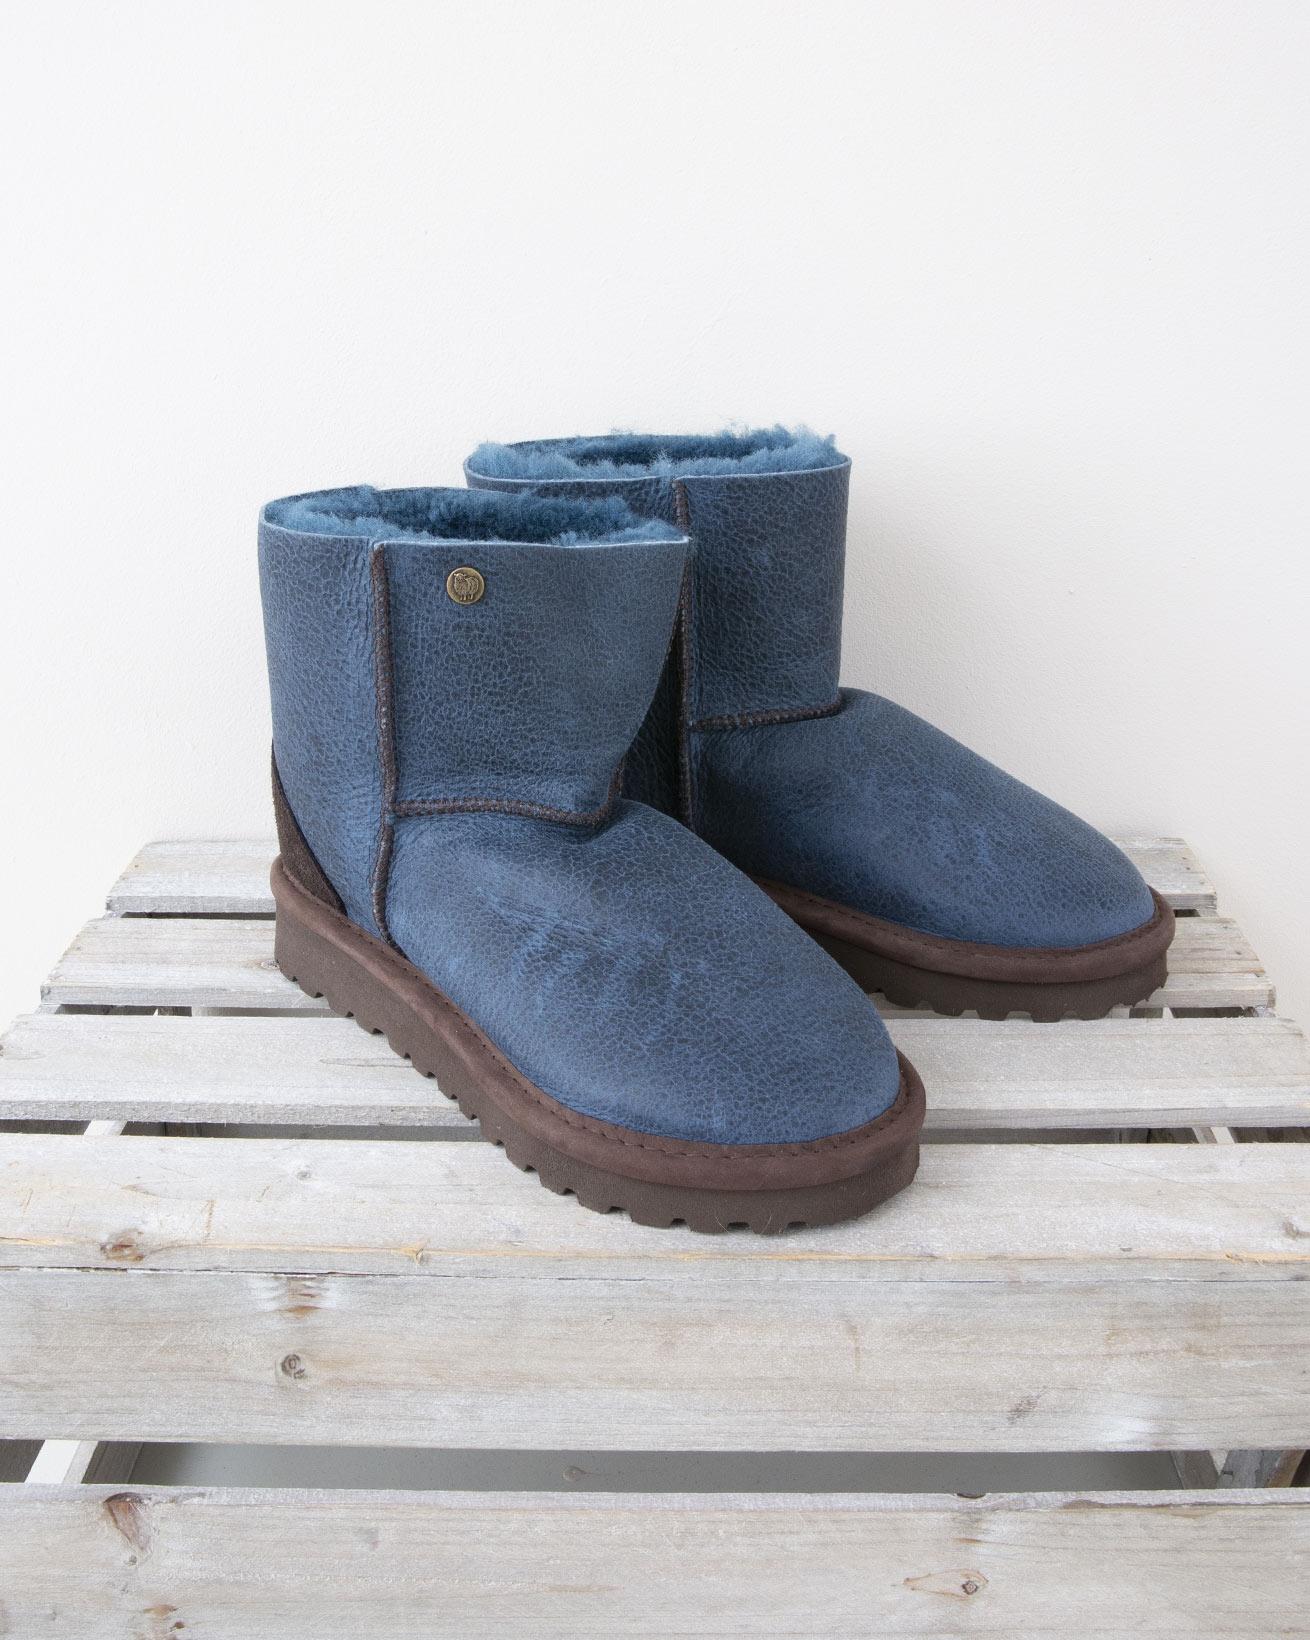 Celt Boot Shortie - Size 6 - Icelandic Blue Nappa finish - 1351